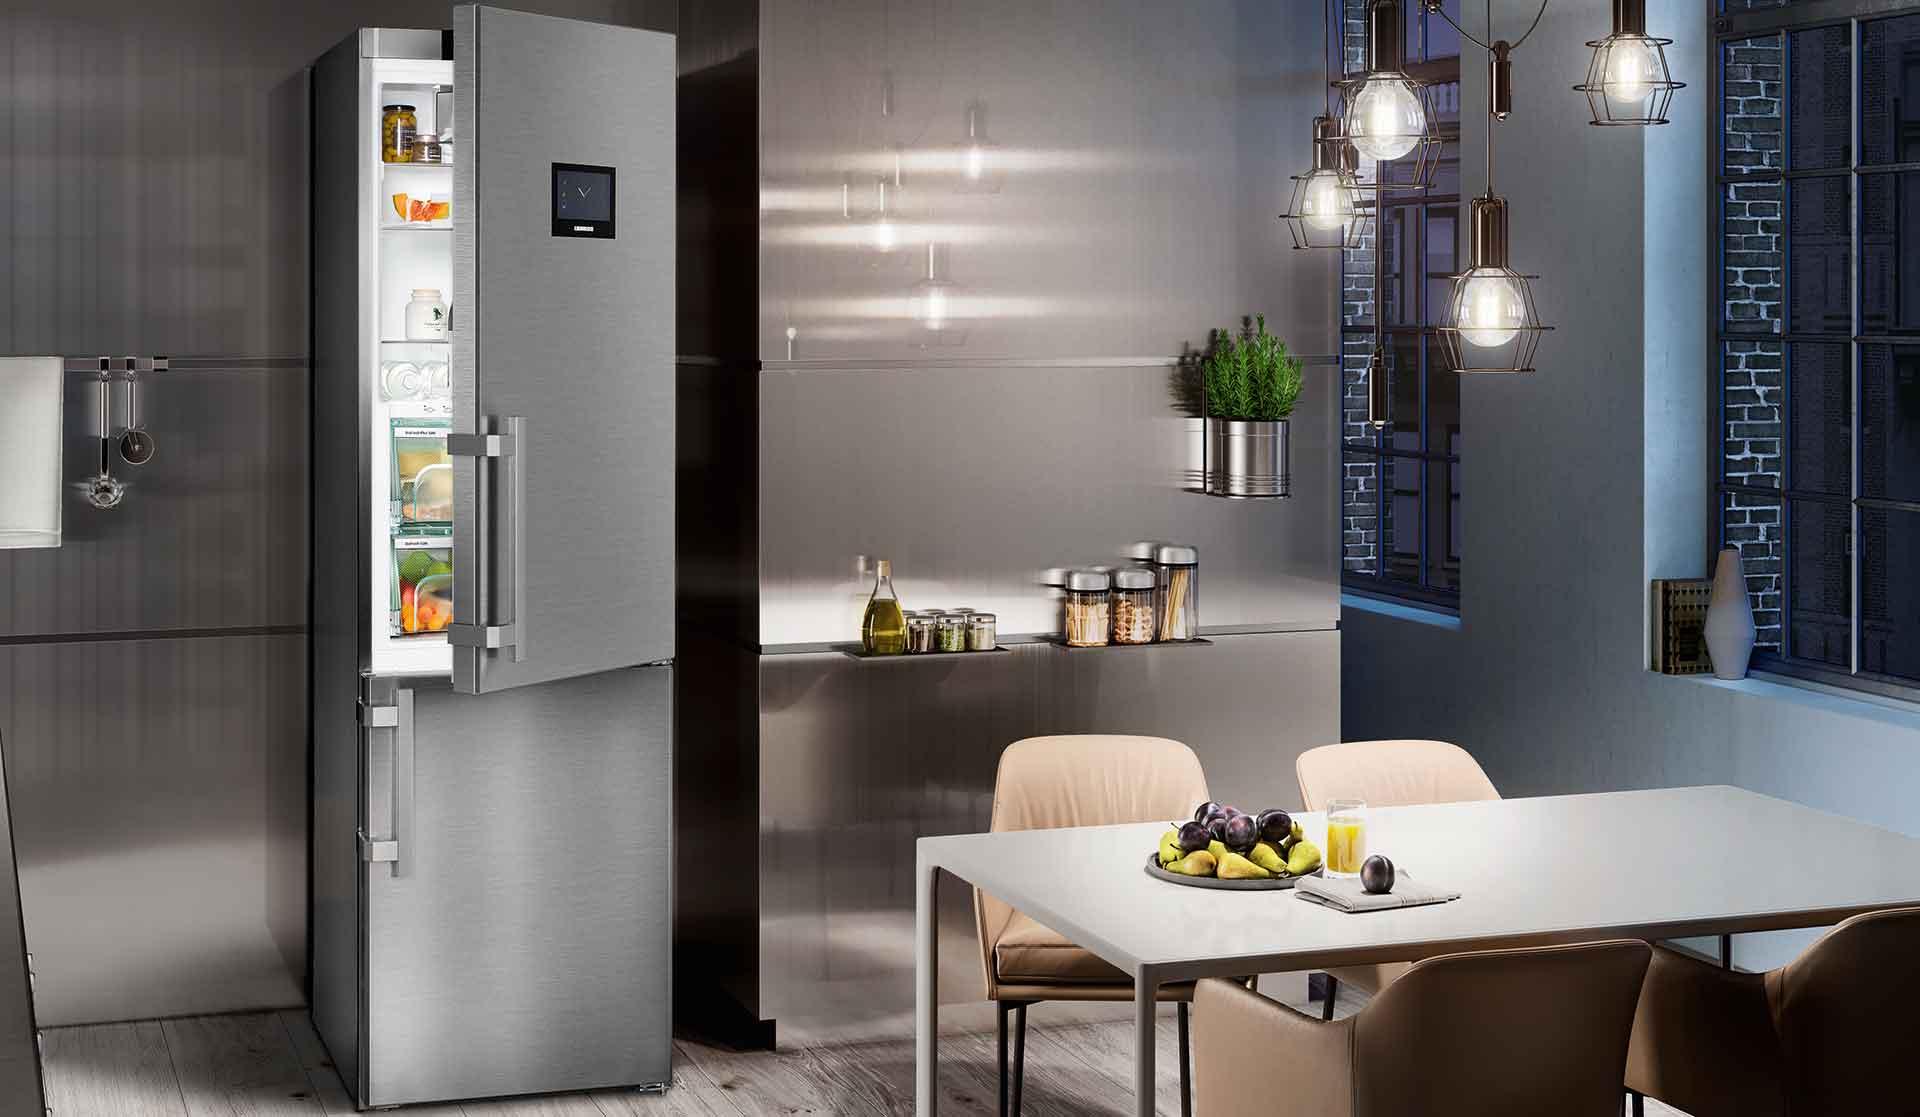 Bosch Kühlschrank Abstand Zur Wand : Bluperformance darum sind wandabstandshalter so nützlich